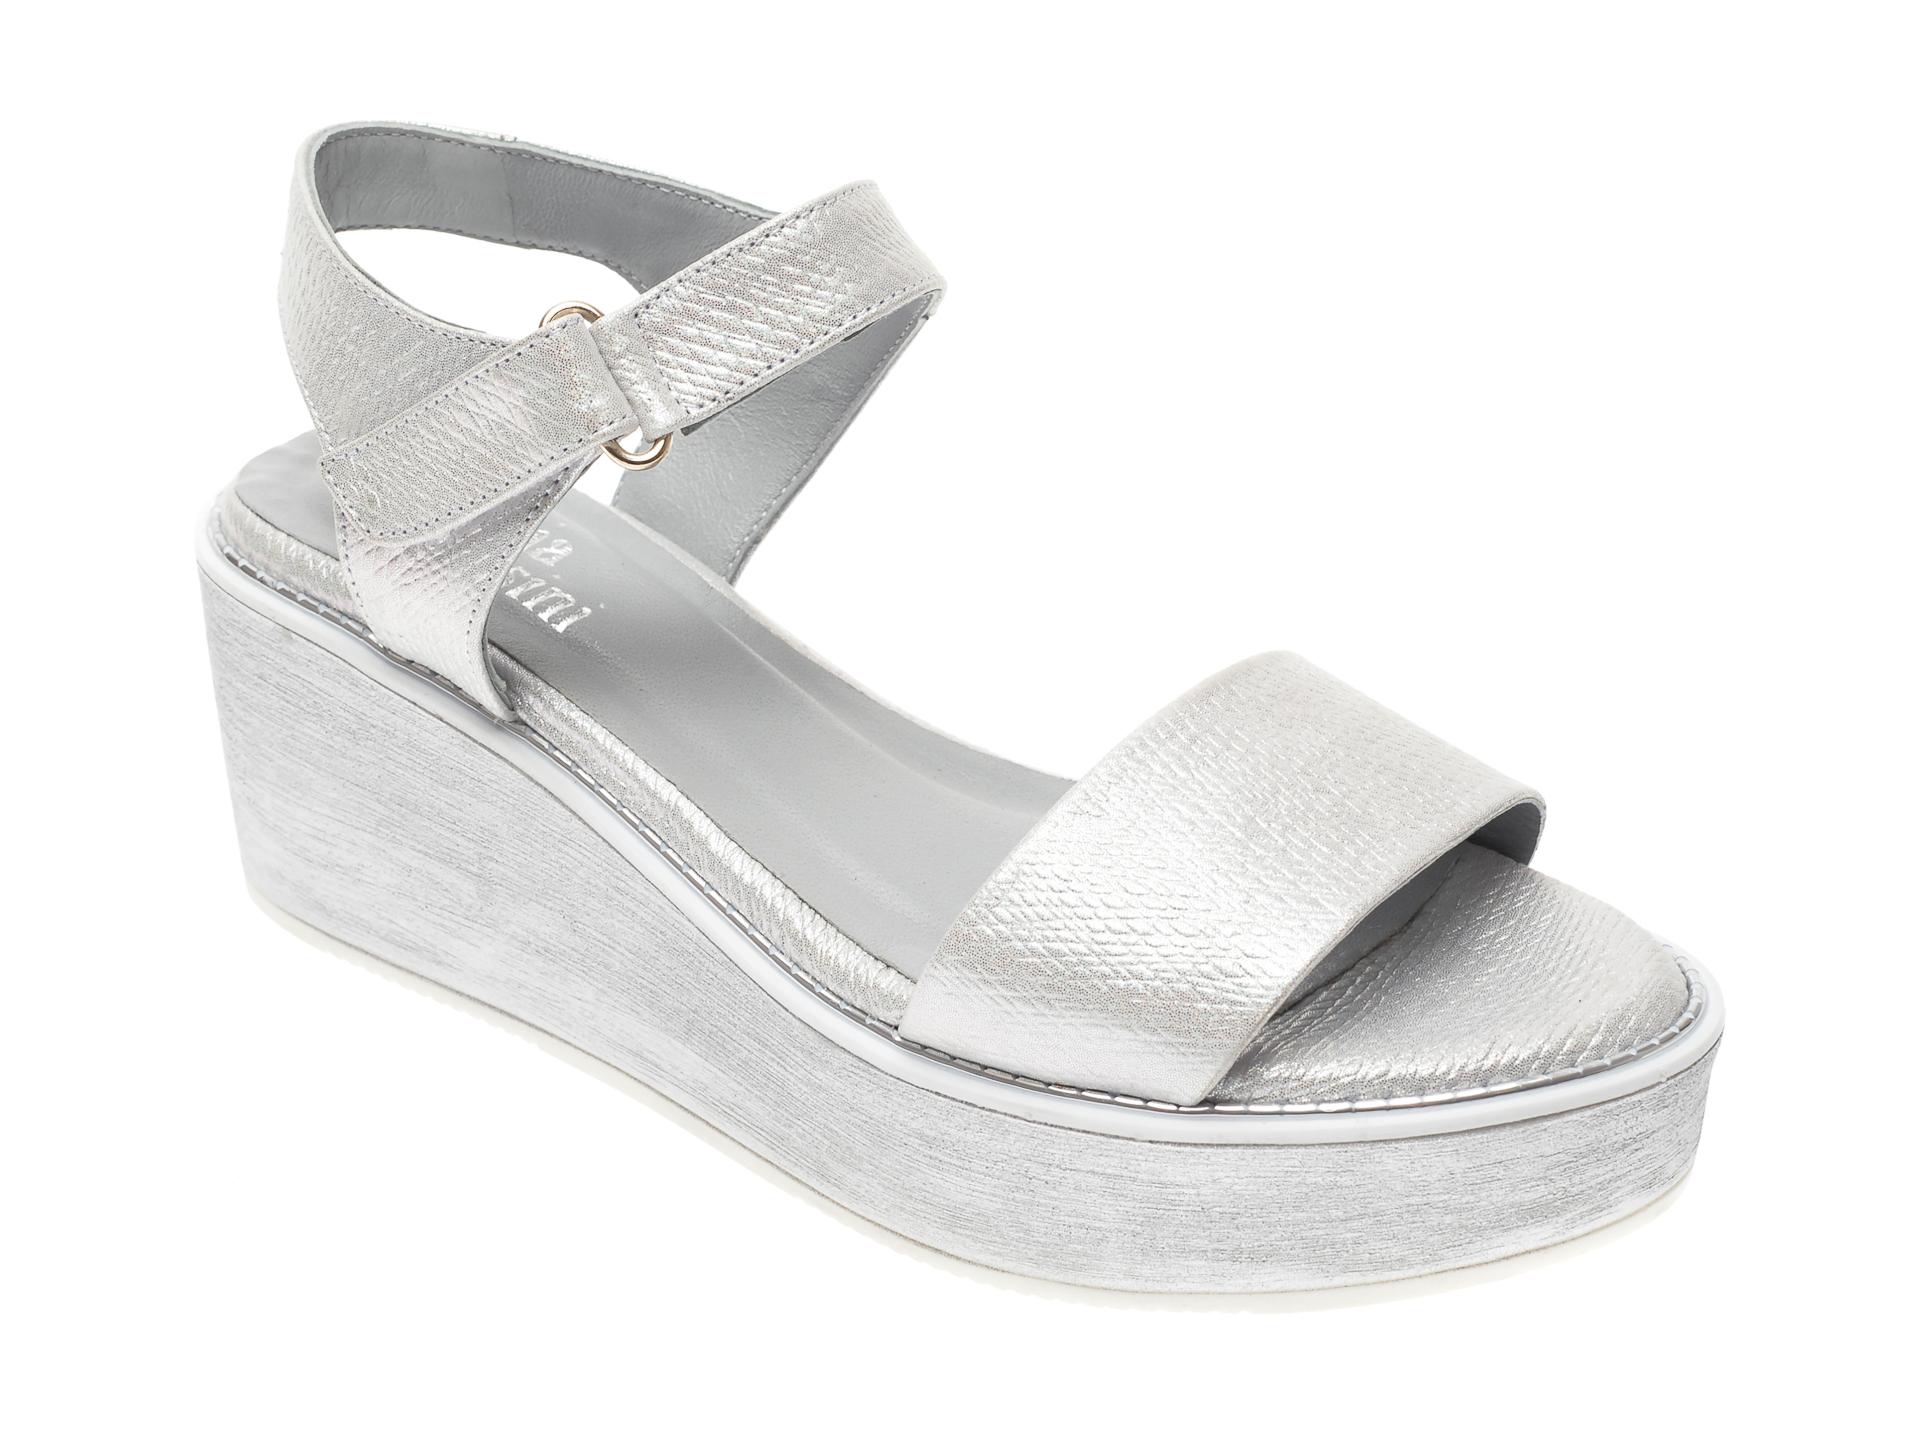 Sandale FLAVIA PASSINI argintii, 887, din piele naturala